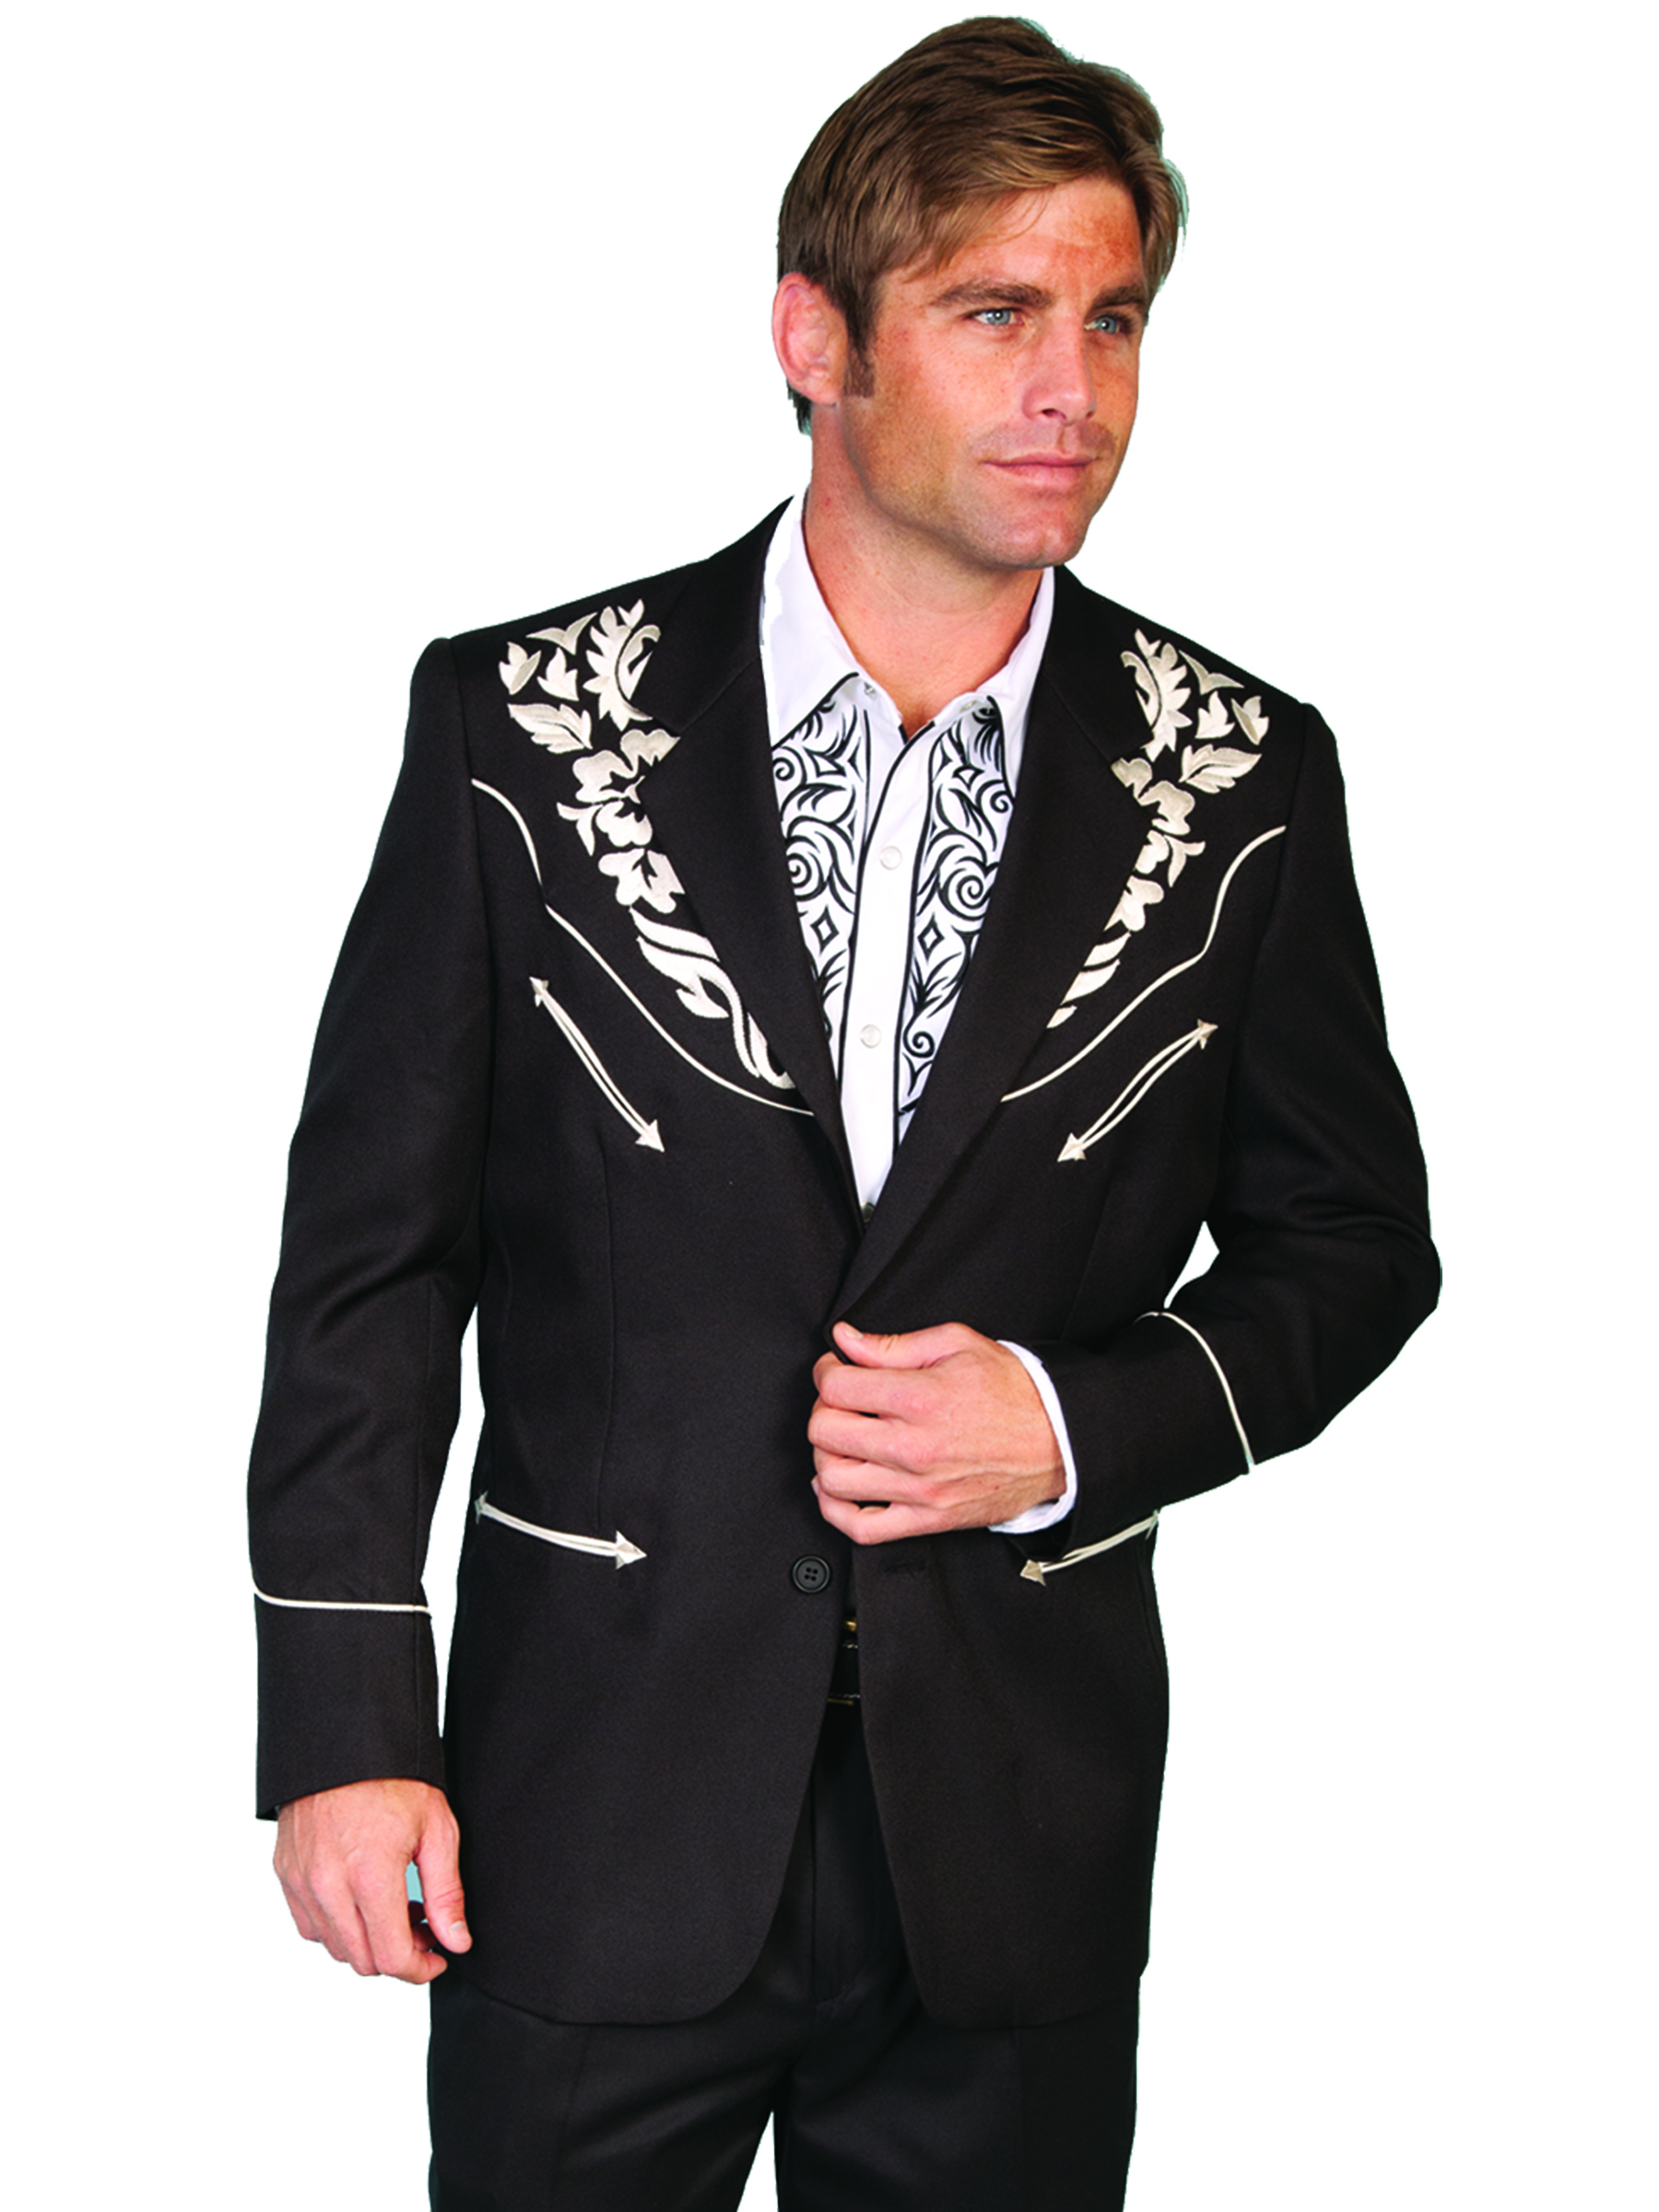 100% polyester button front blazer